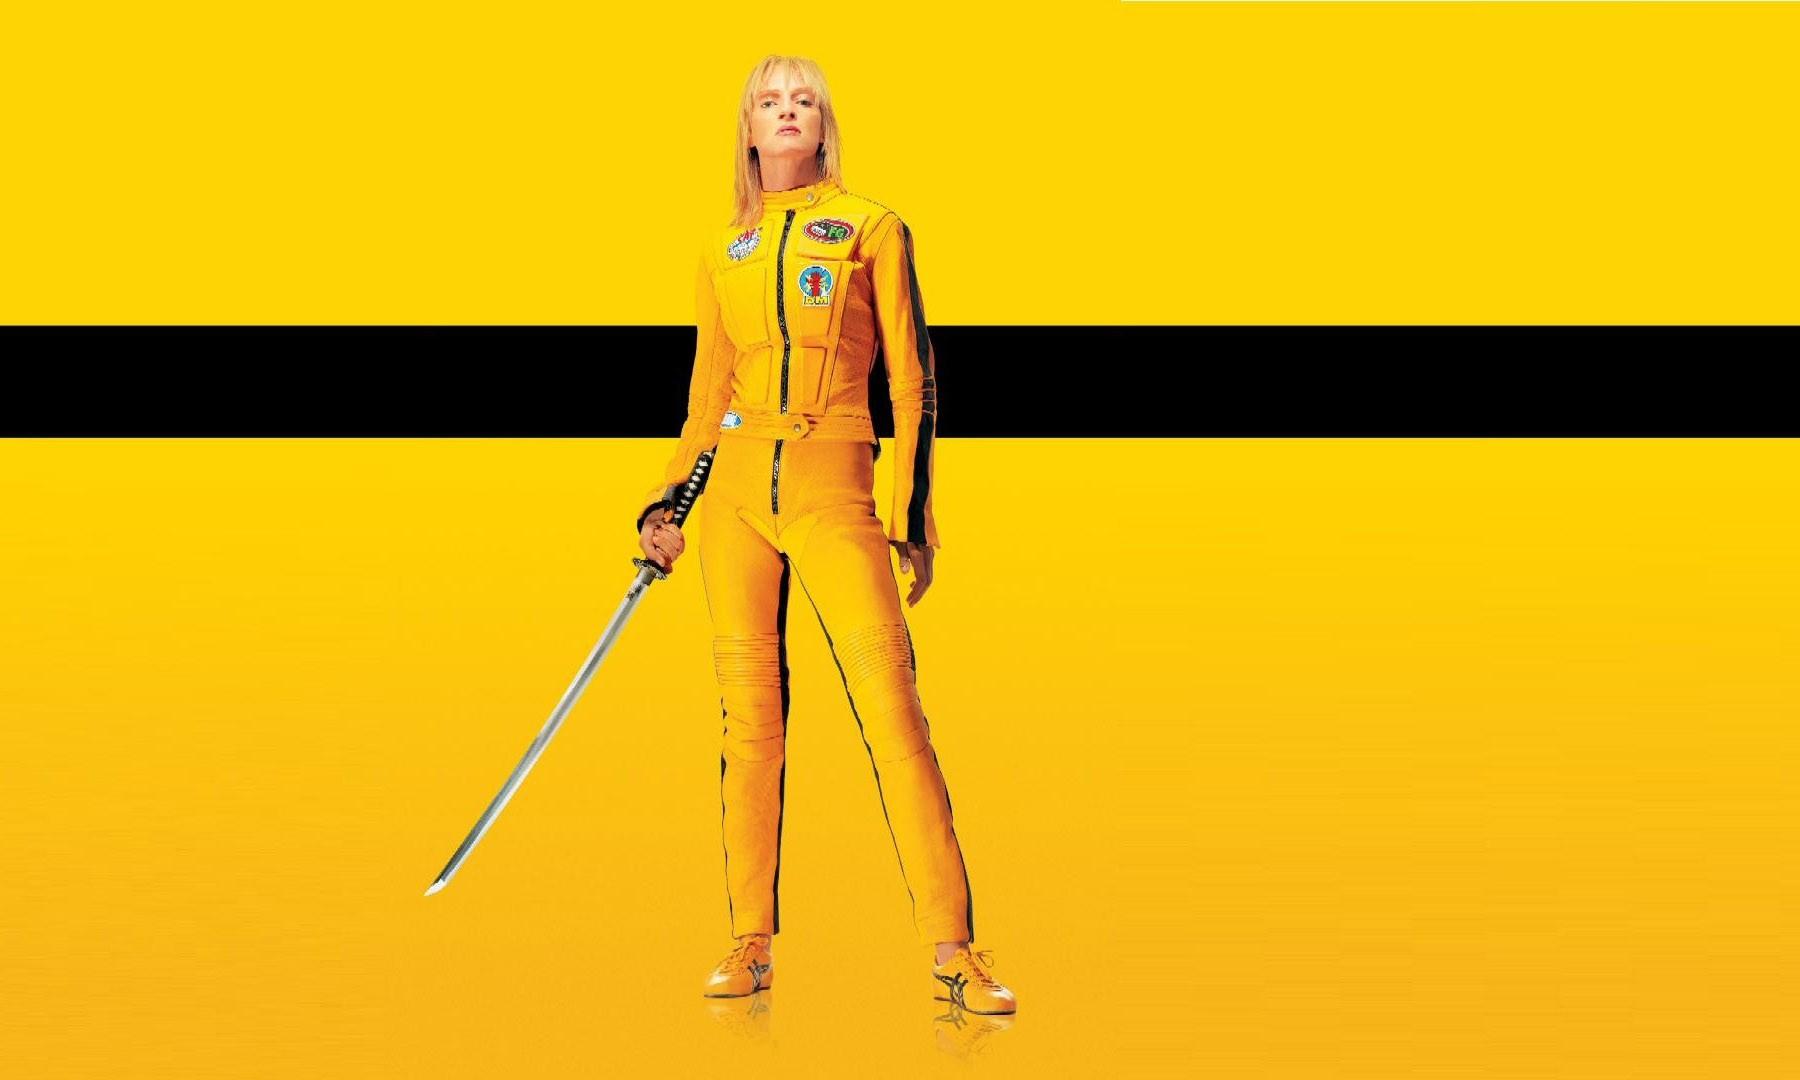 《Kill Bill》续集将至?Quentin Tarantino 表示非常有可能